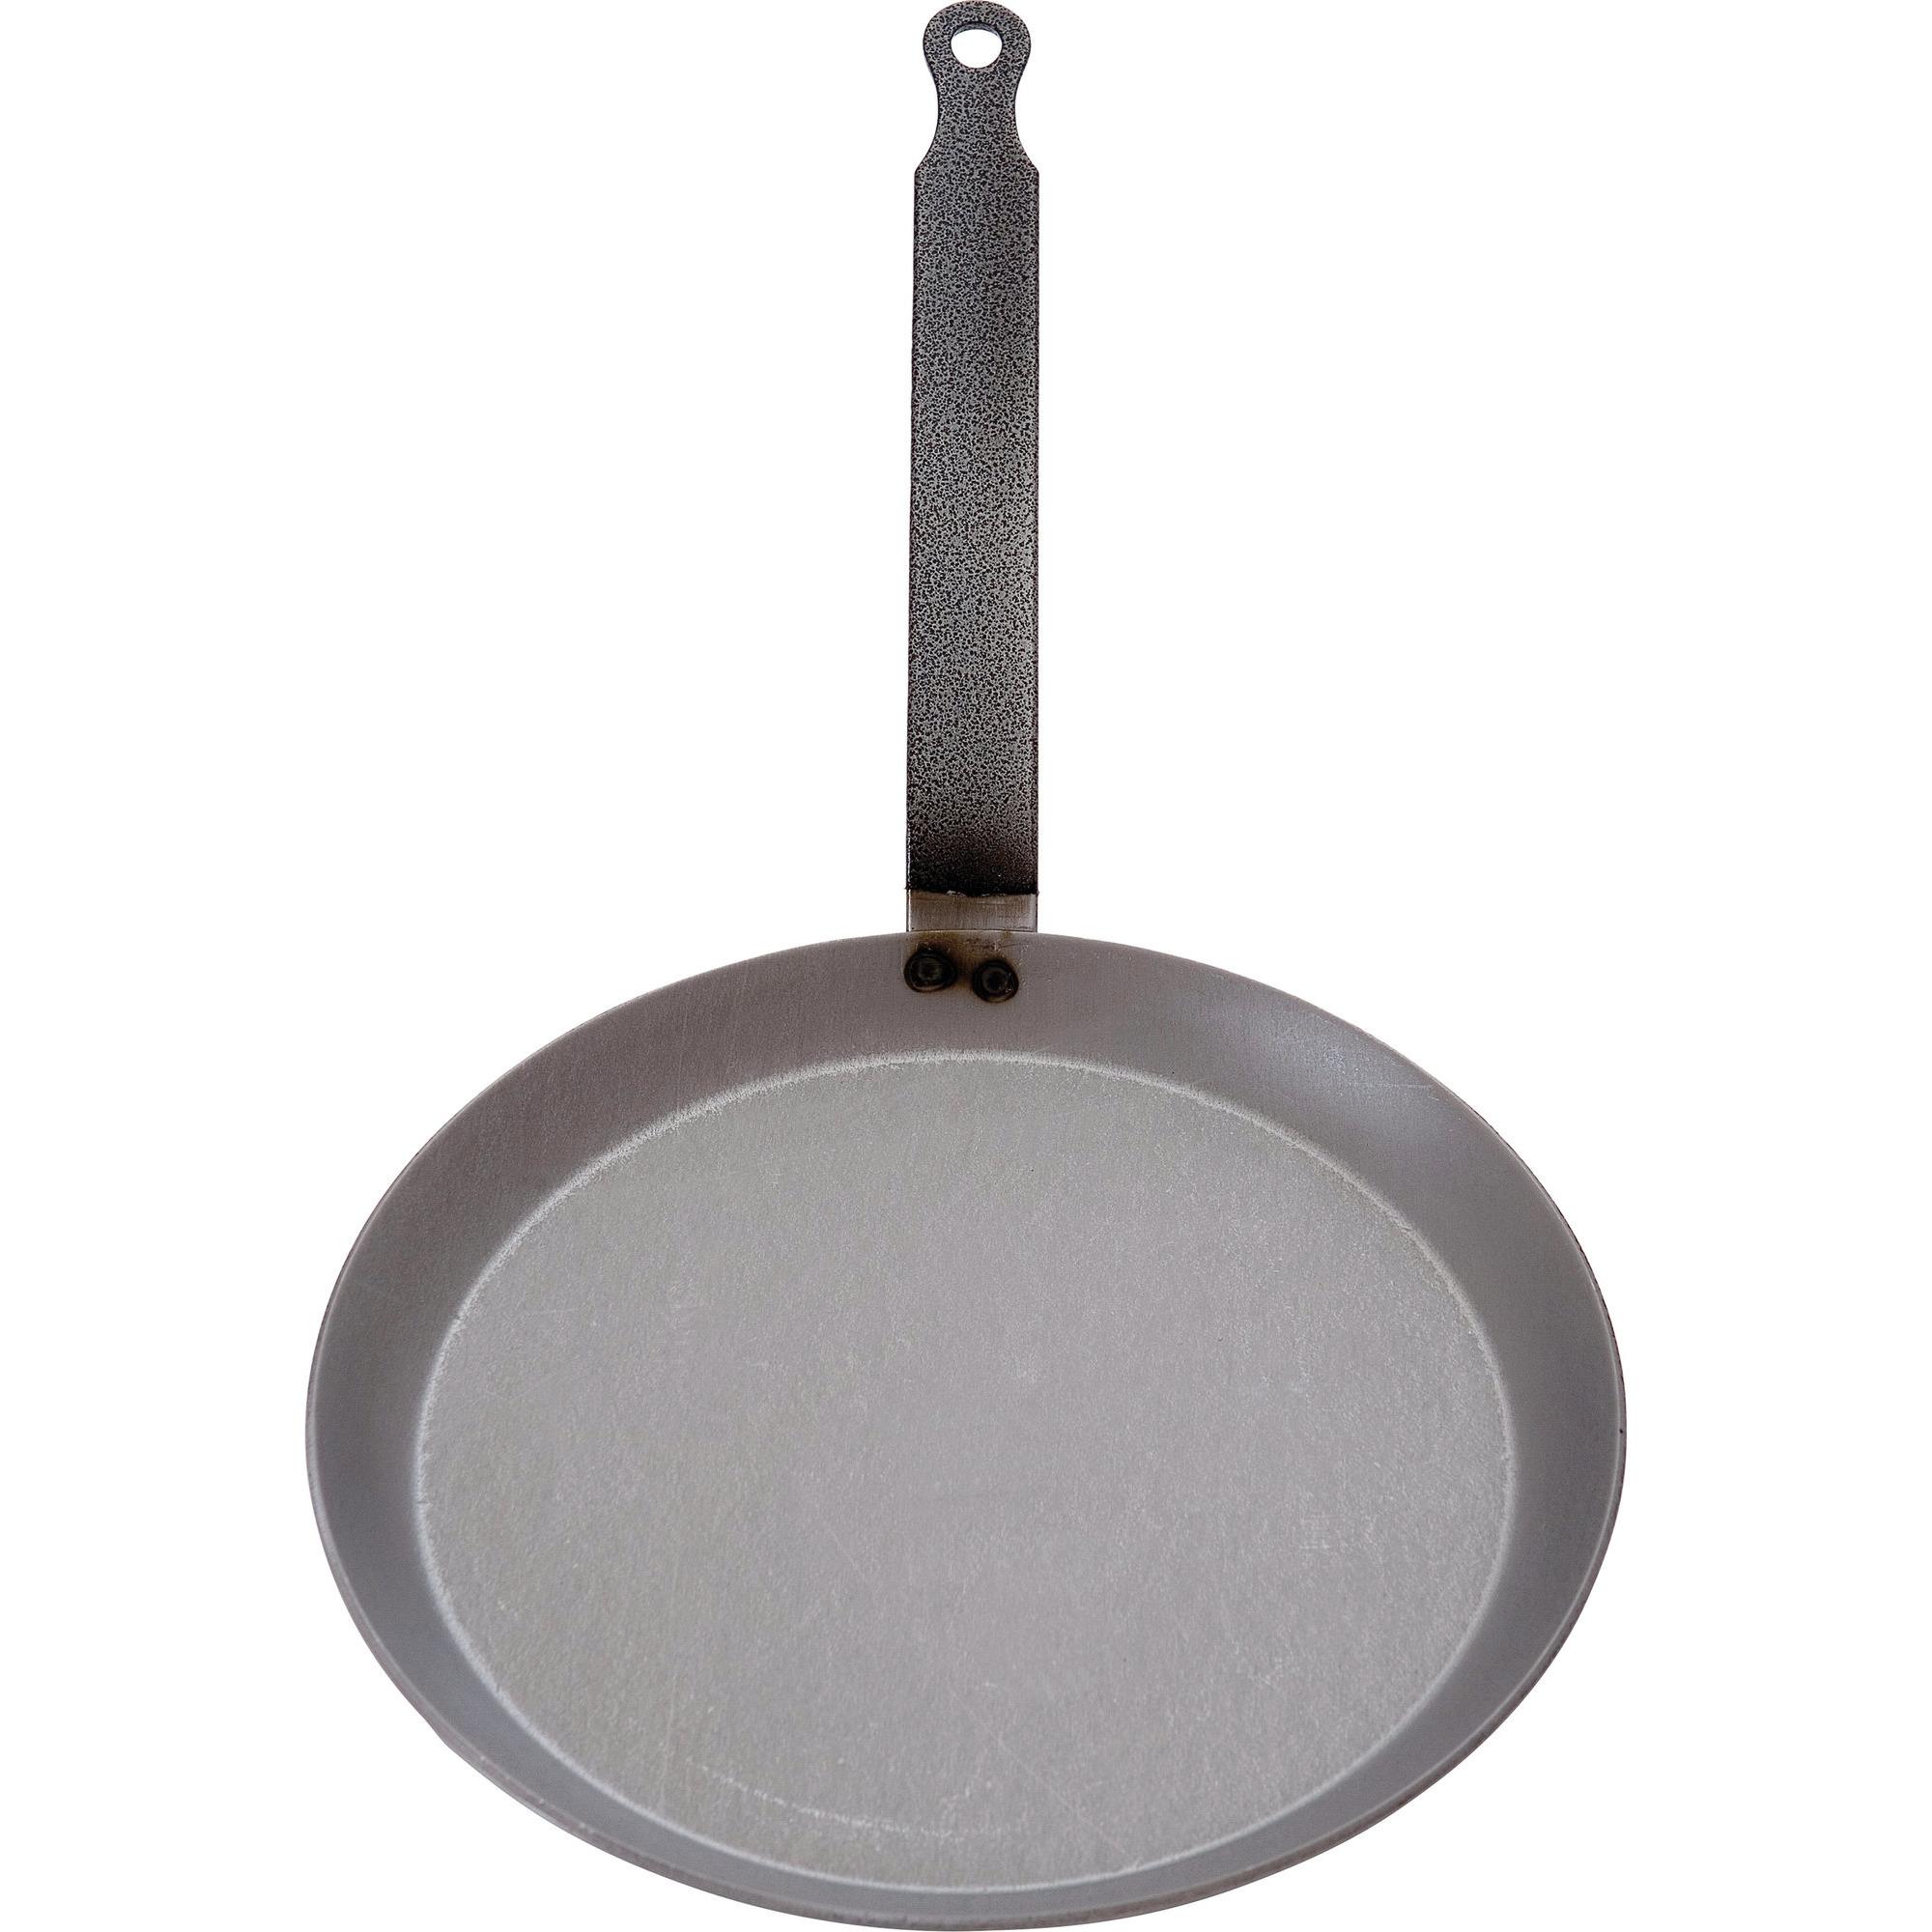 Mauviel Crêpe/pannkakspanna plåt Ø 20 cm